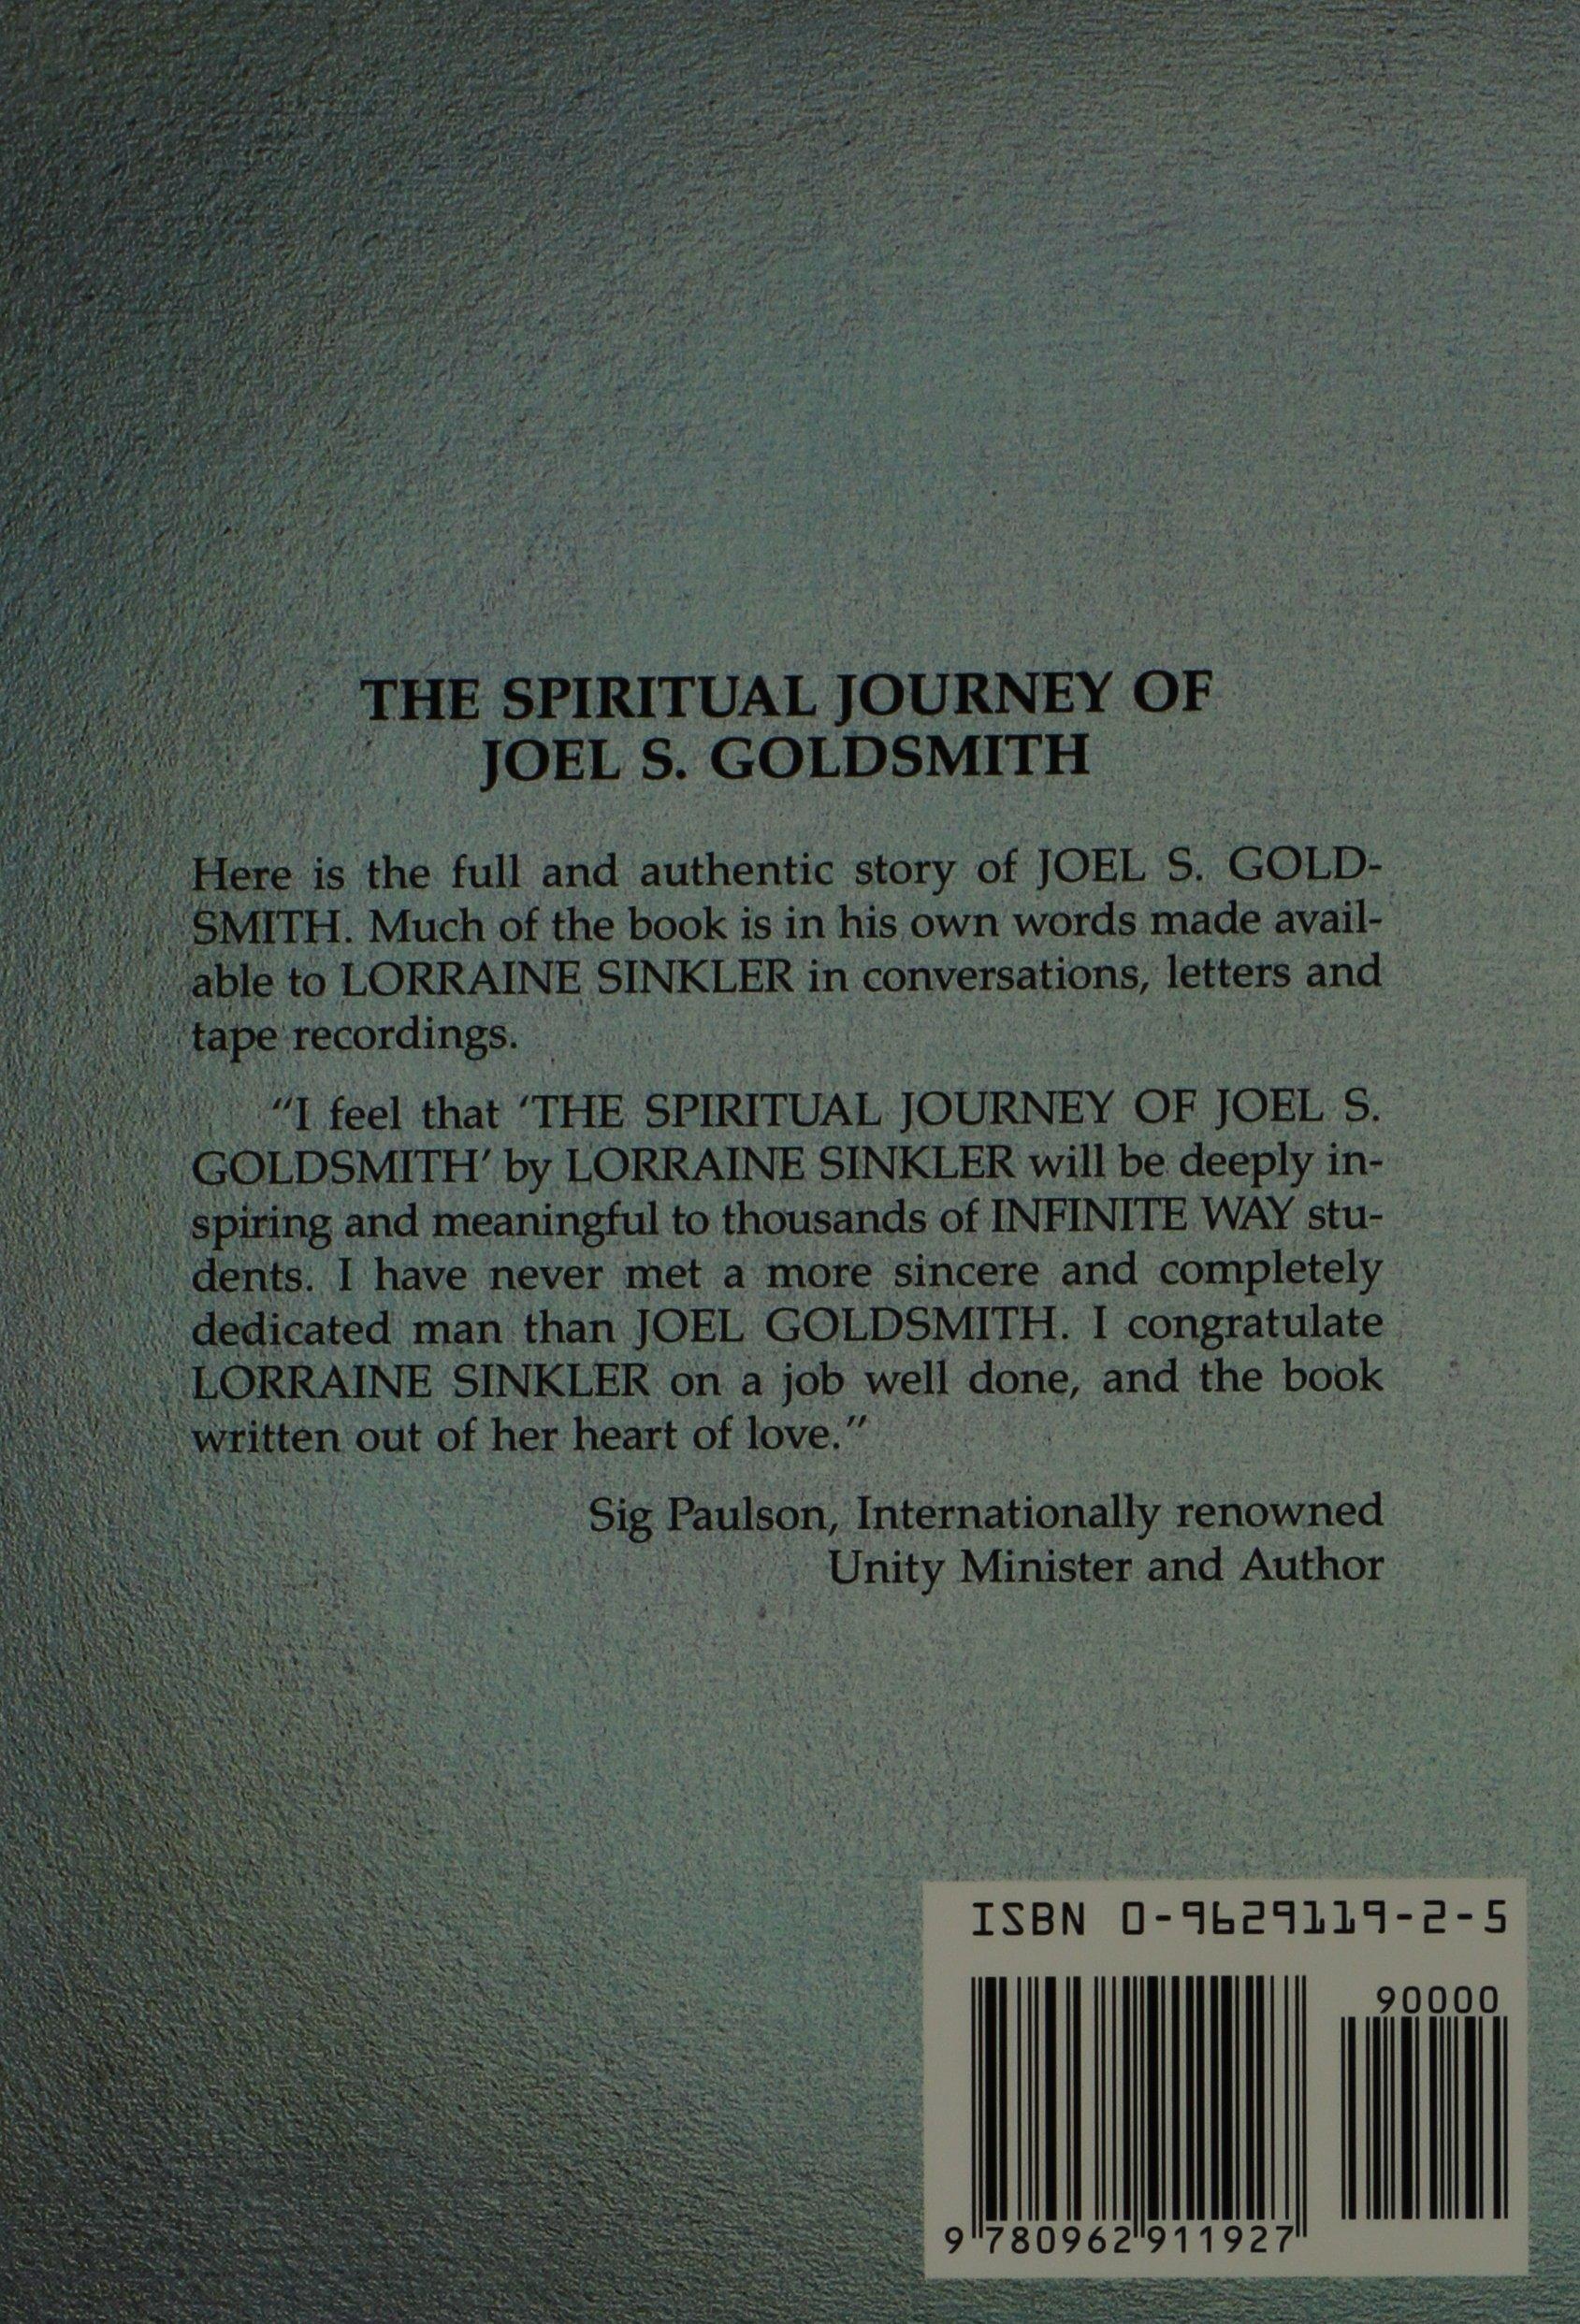 The spiritual journey of joel s goldsmith lorraine sinkler 9780962911927 amazon com books